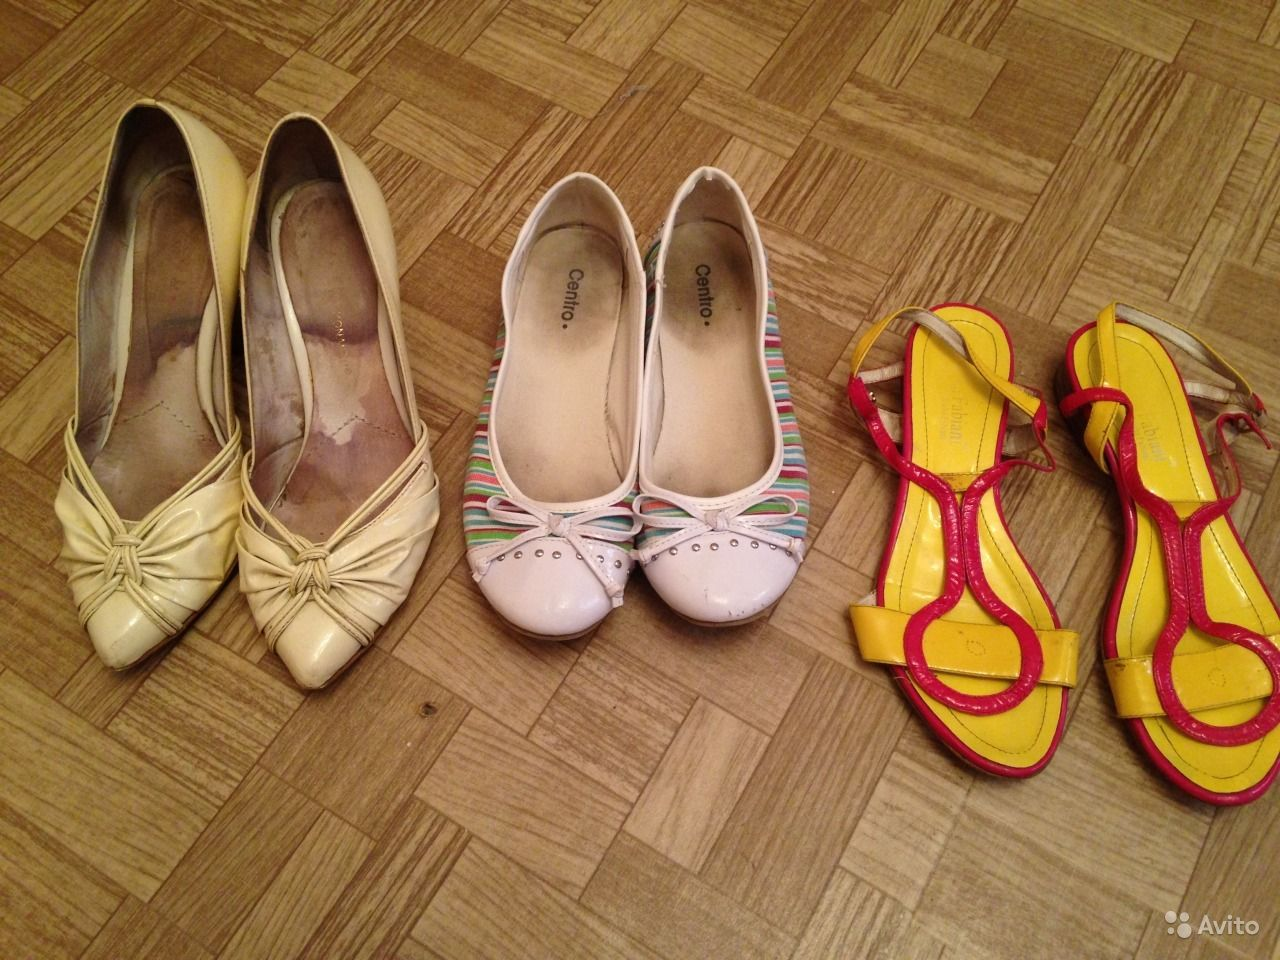 Обувь майорал интернет магазин